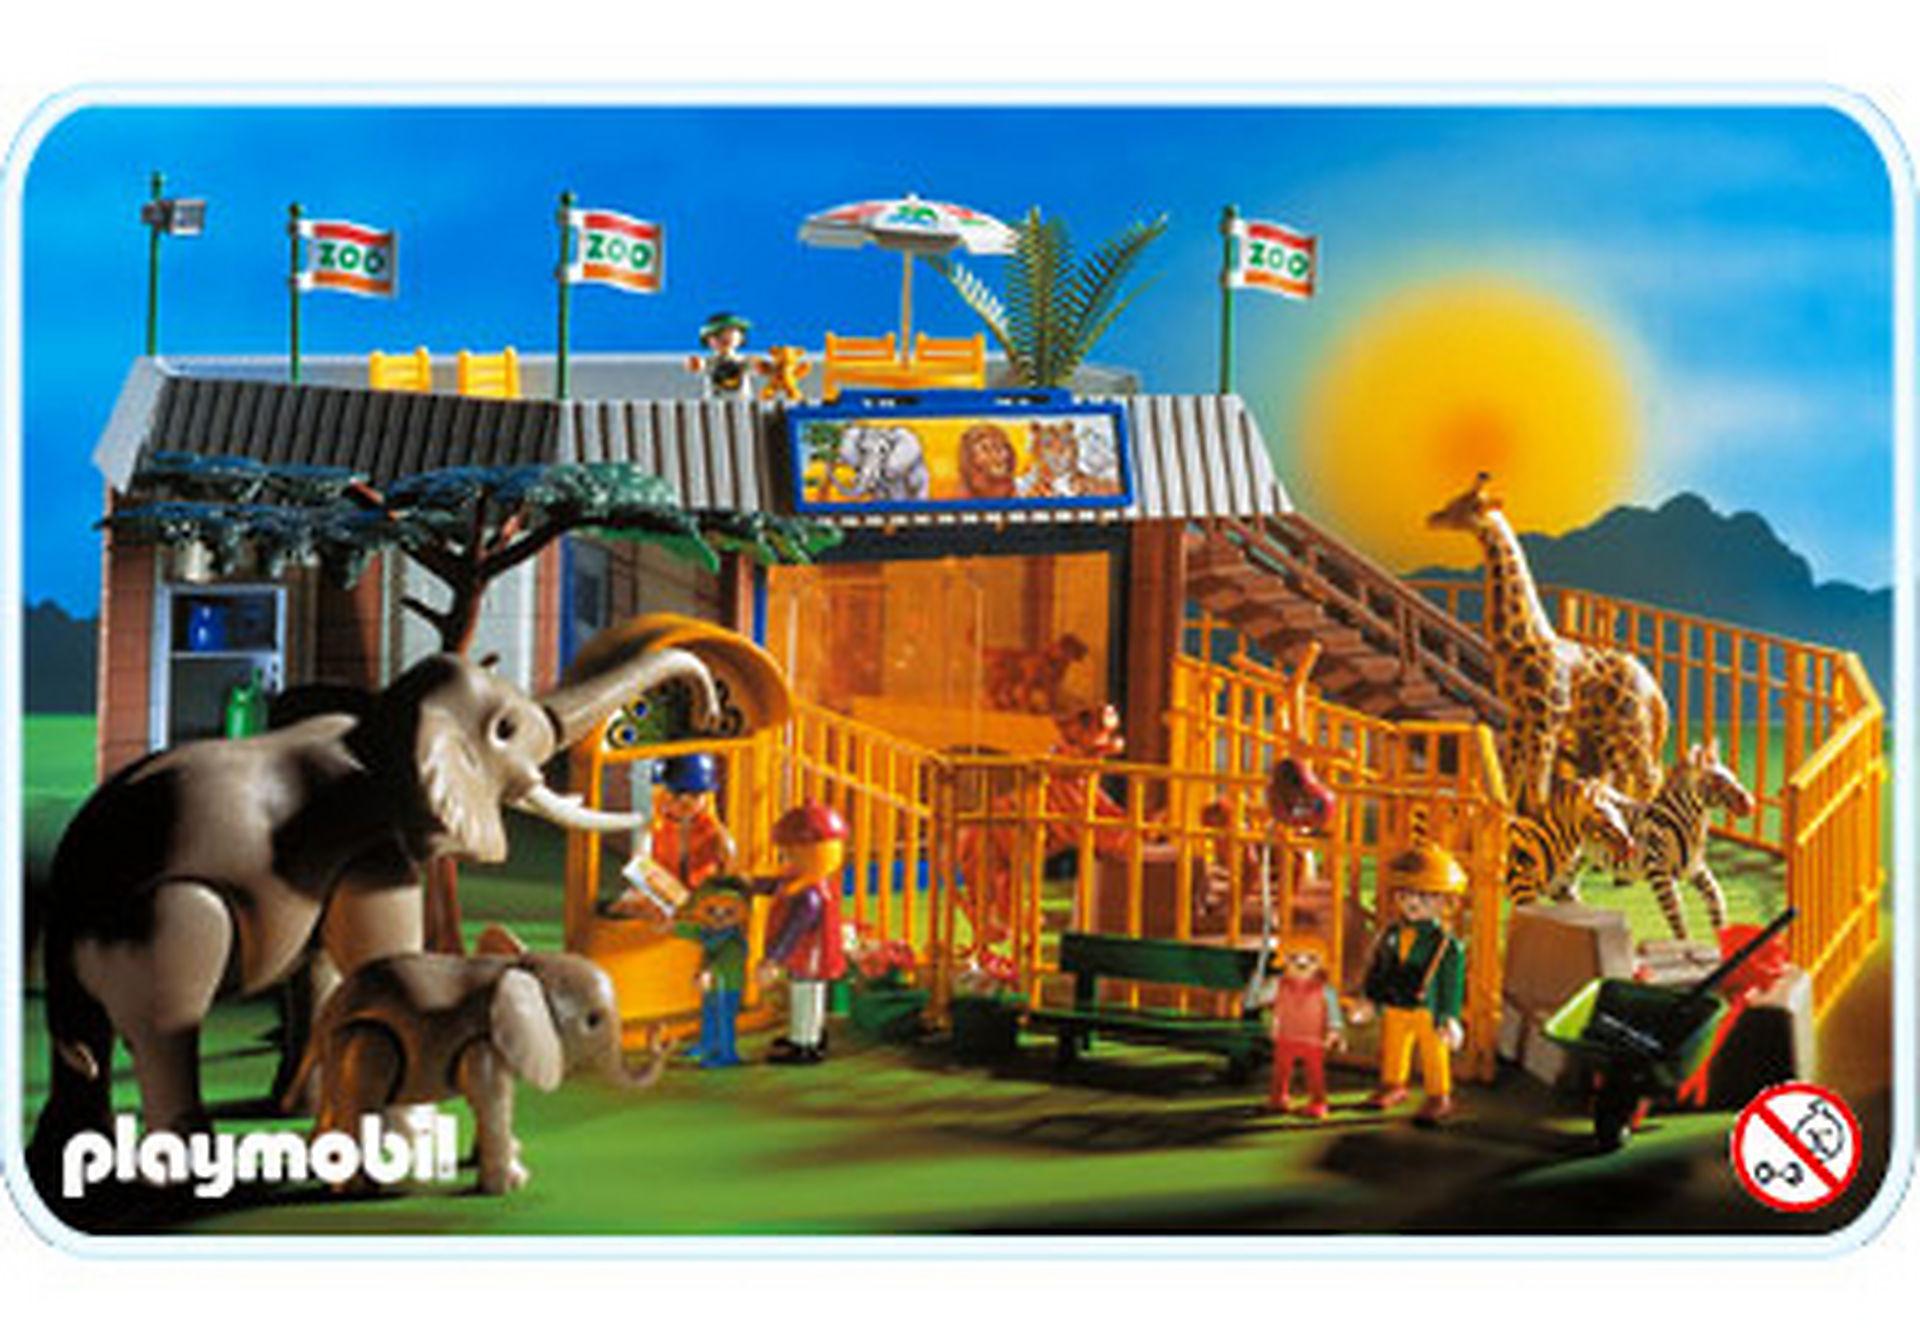 http://media.playmobil.com/i/playmobil/3634-A_product_detail/Grosses Tierhaus